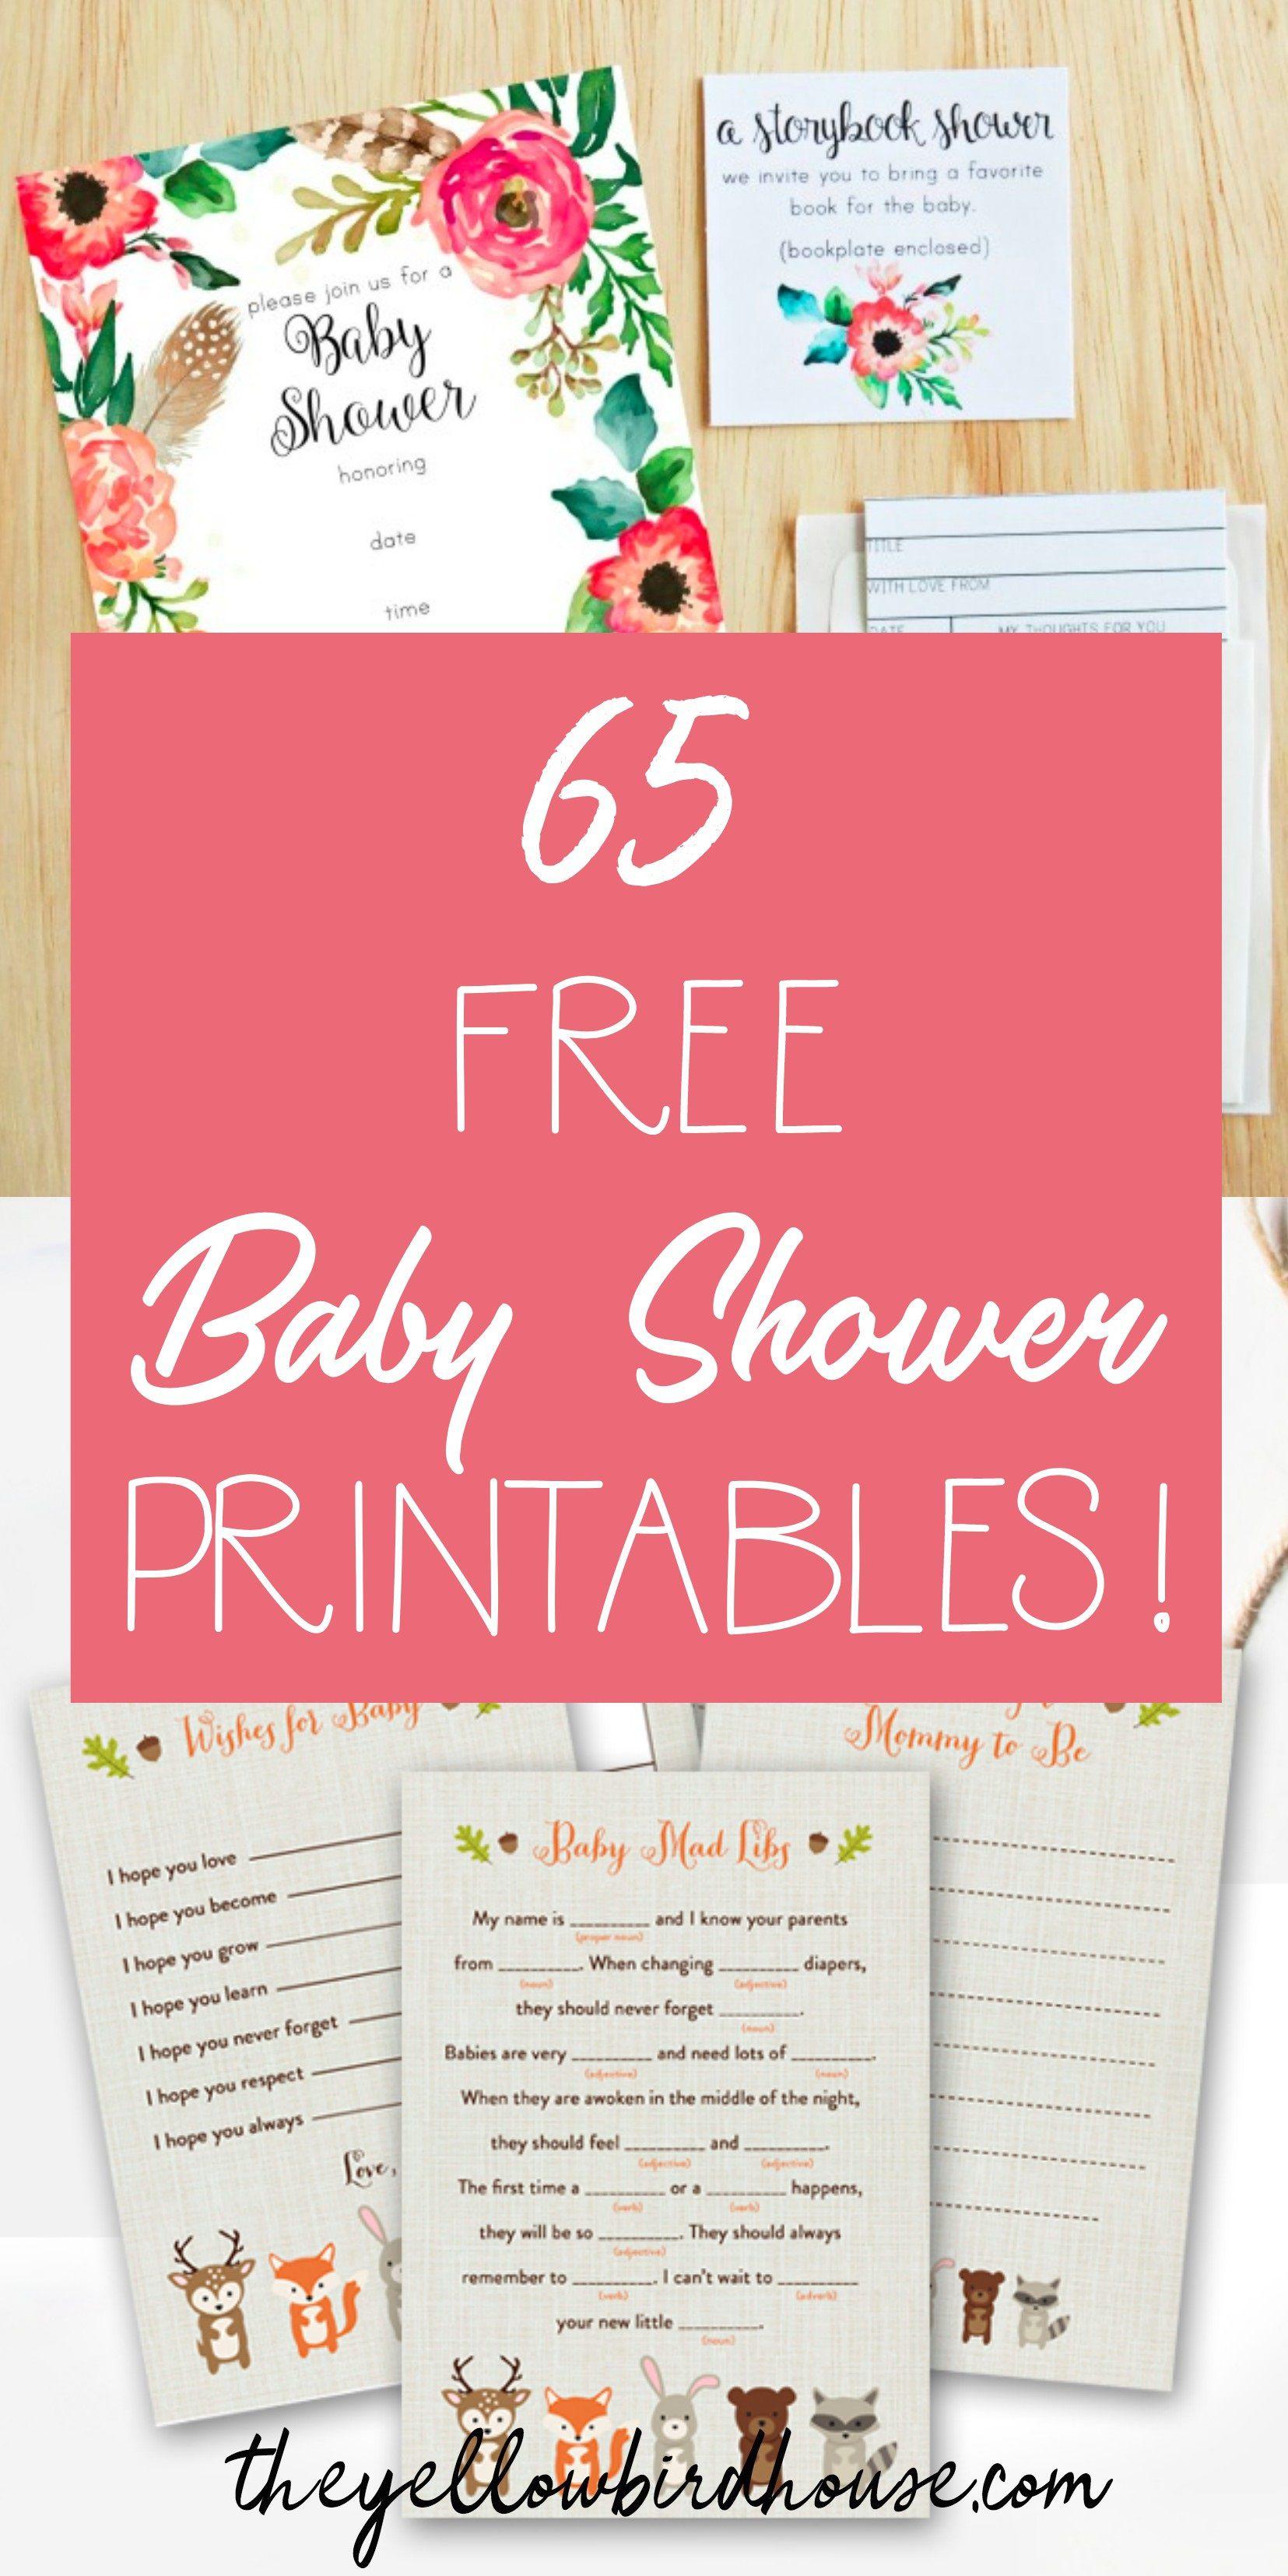 006 Unbelievable Baby Shower Printable Girl Inspiration  Sheet Cake Cute For AFull